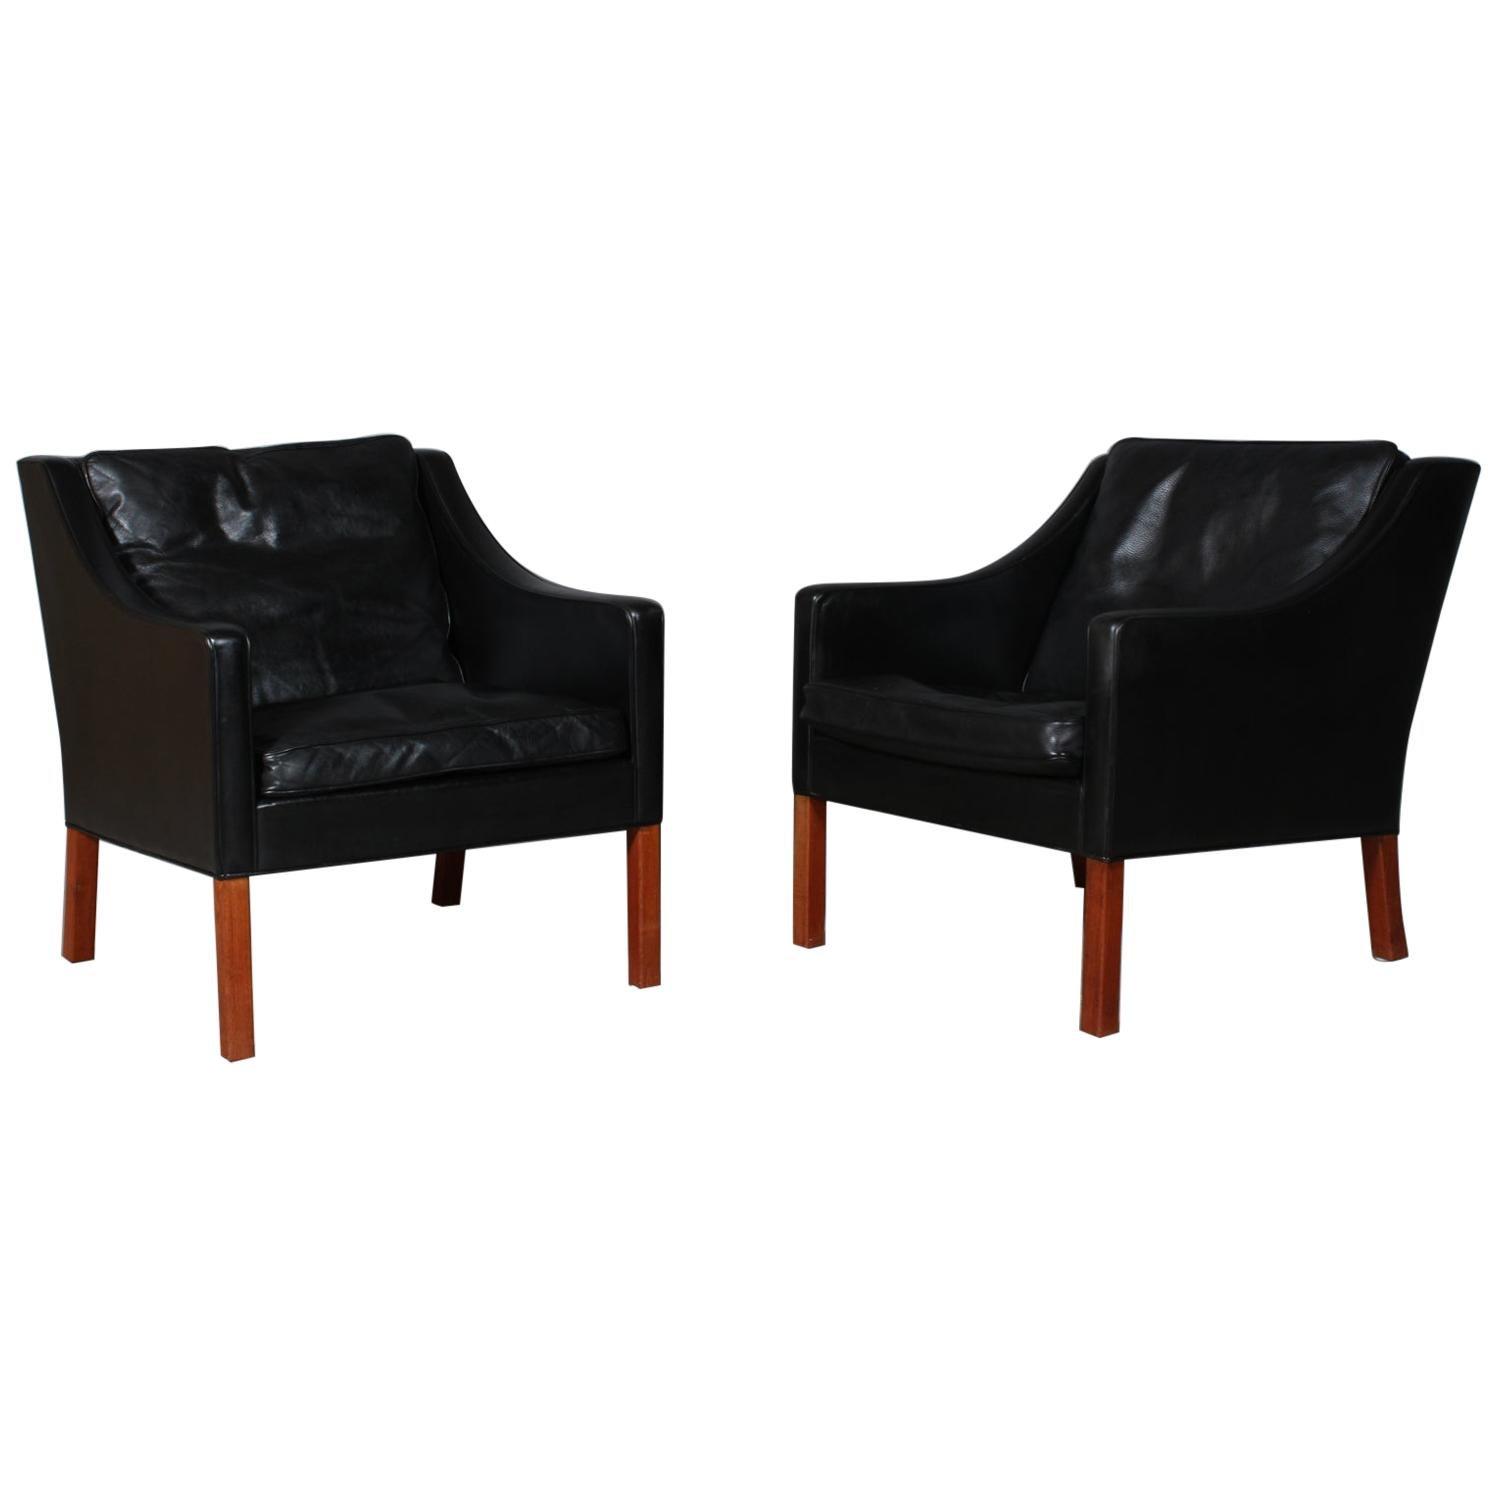 Model 2207 Lounge Chair